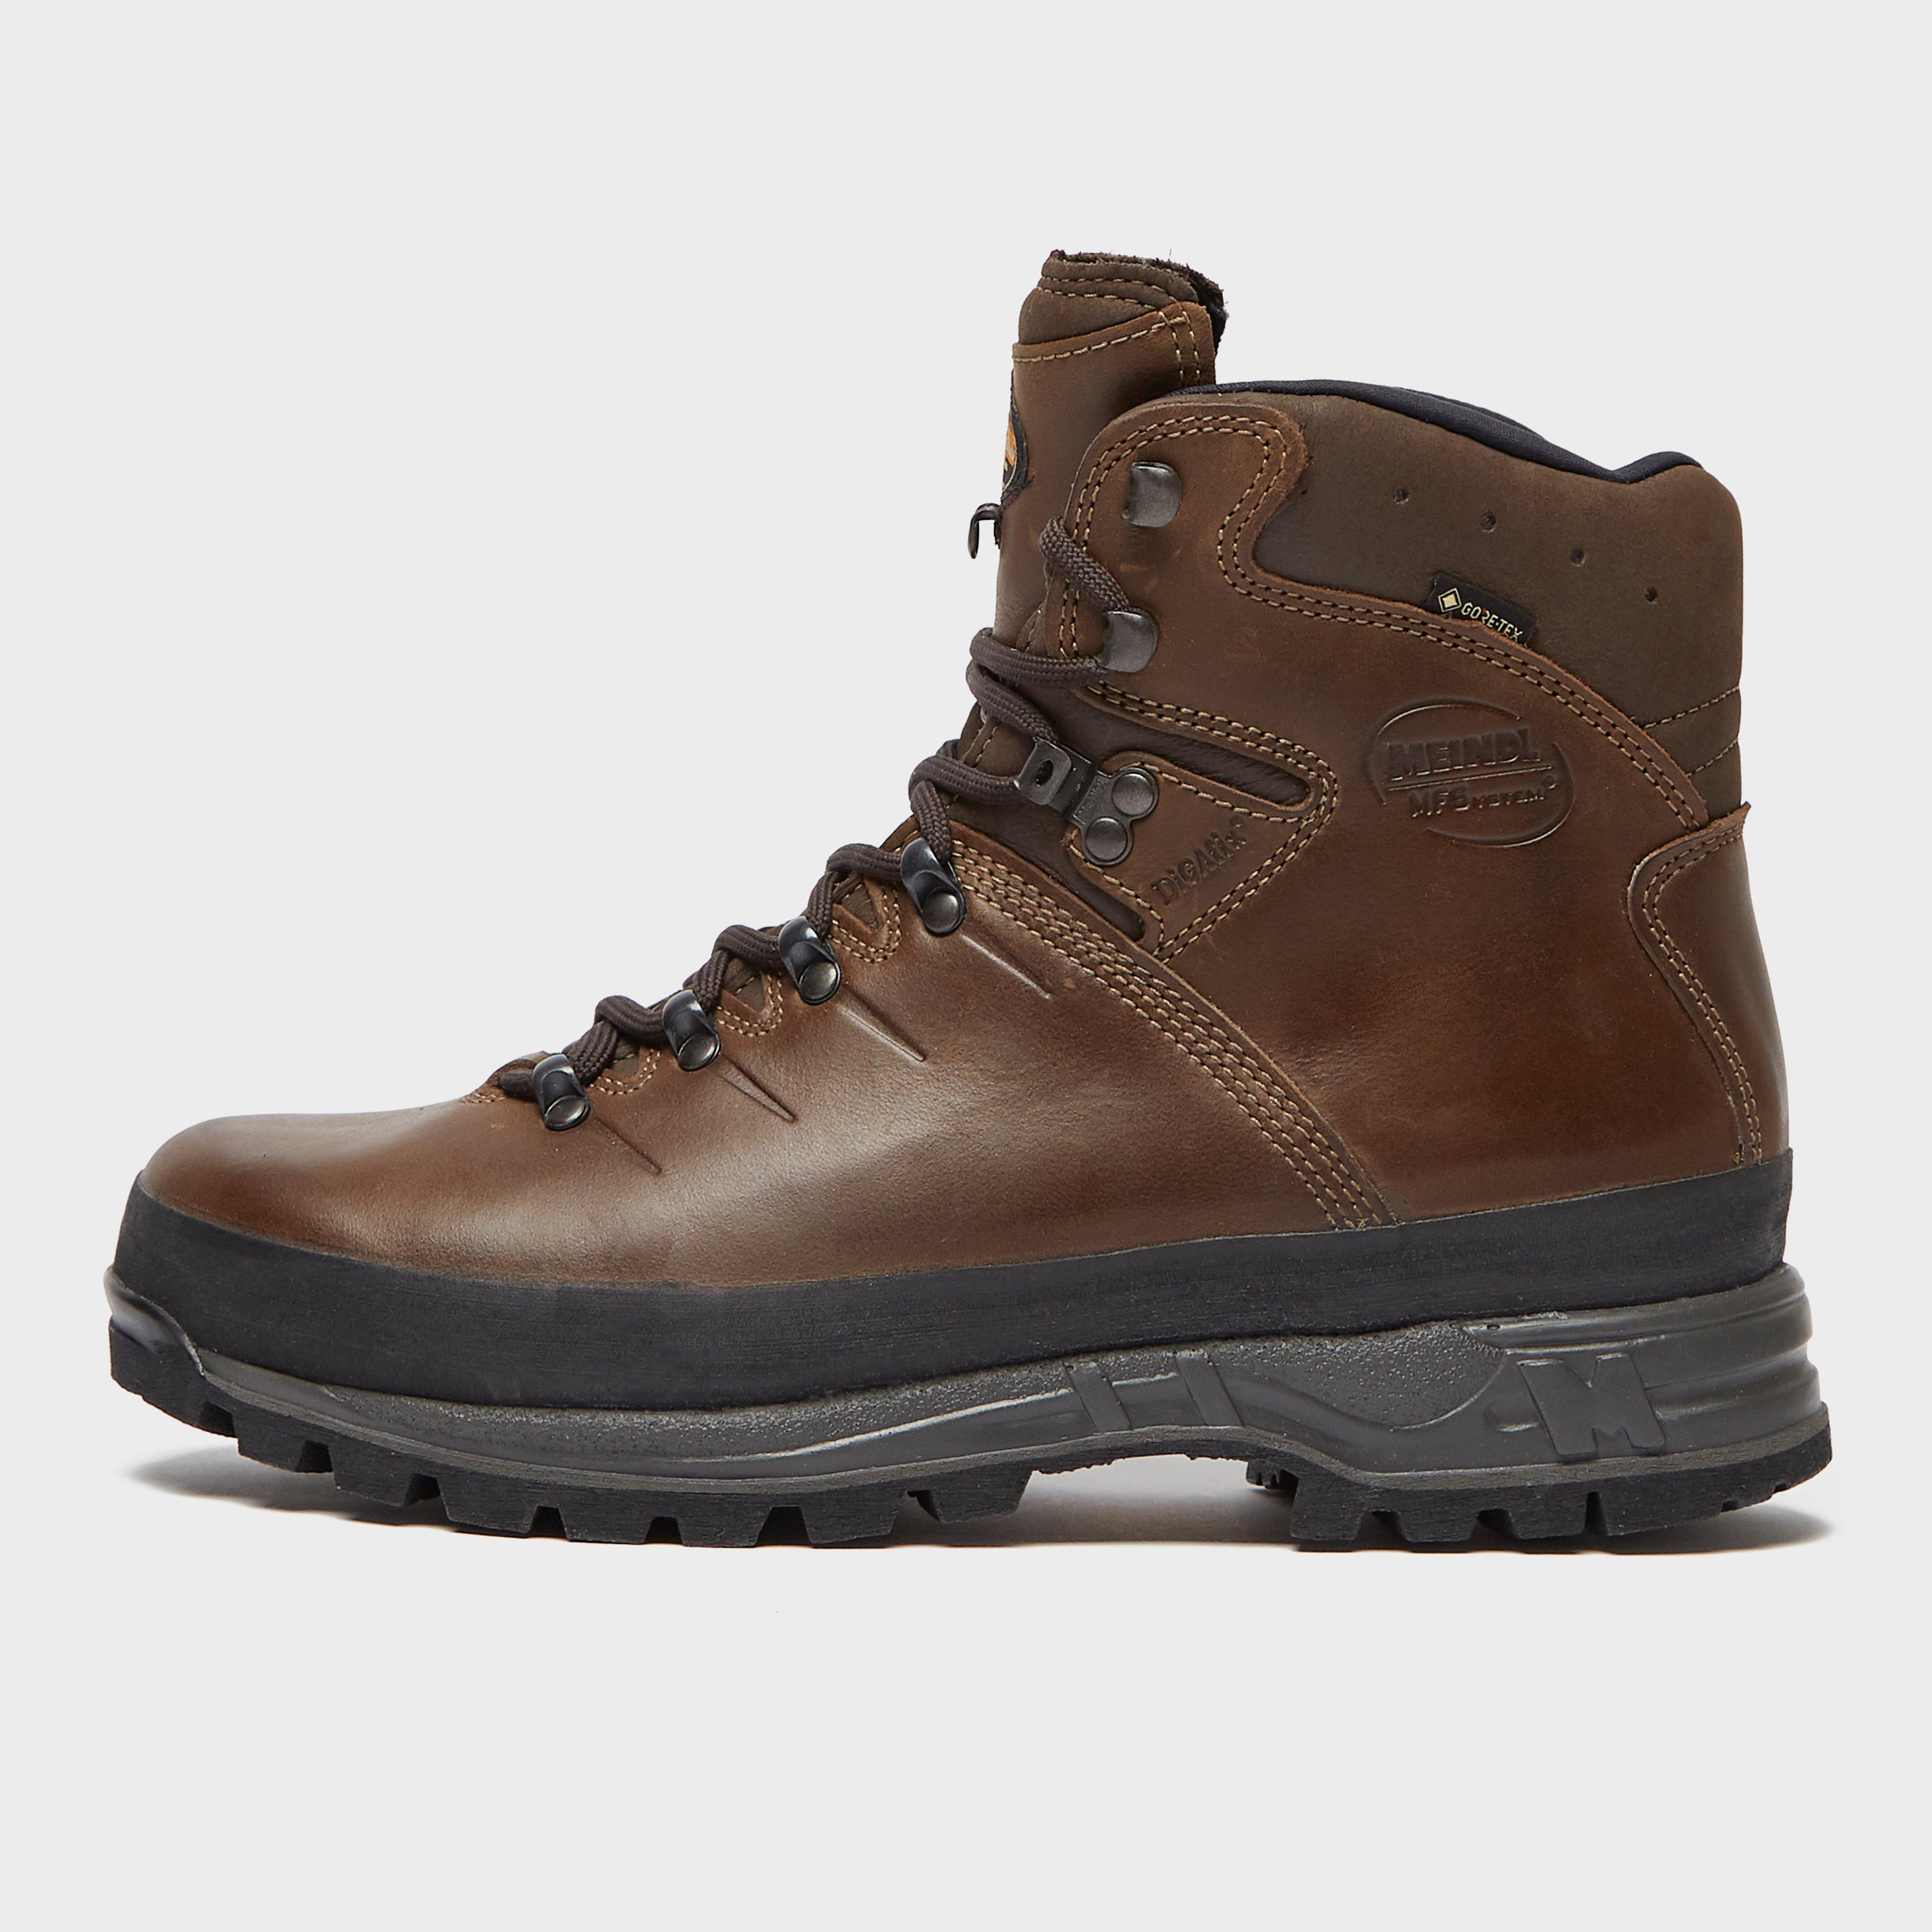 2cb10e08afb Bhutan MFS Walking Boot